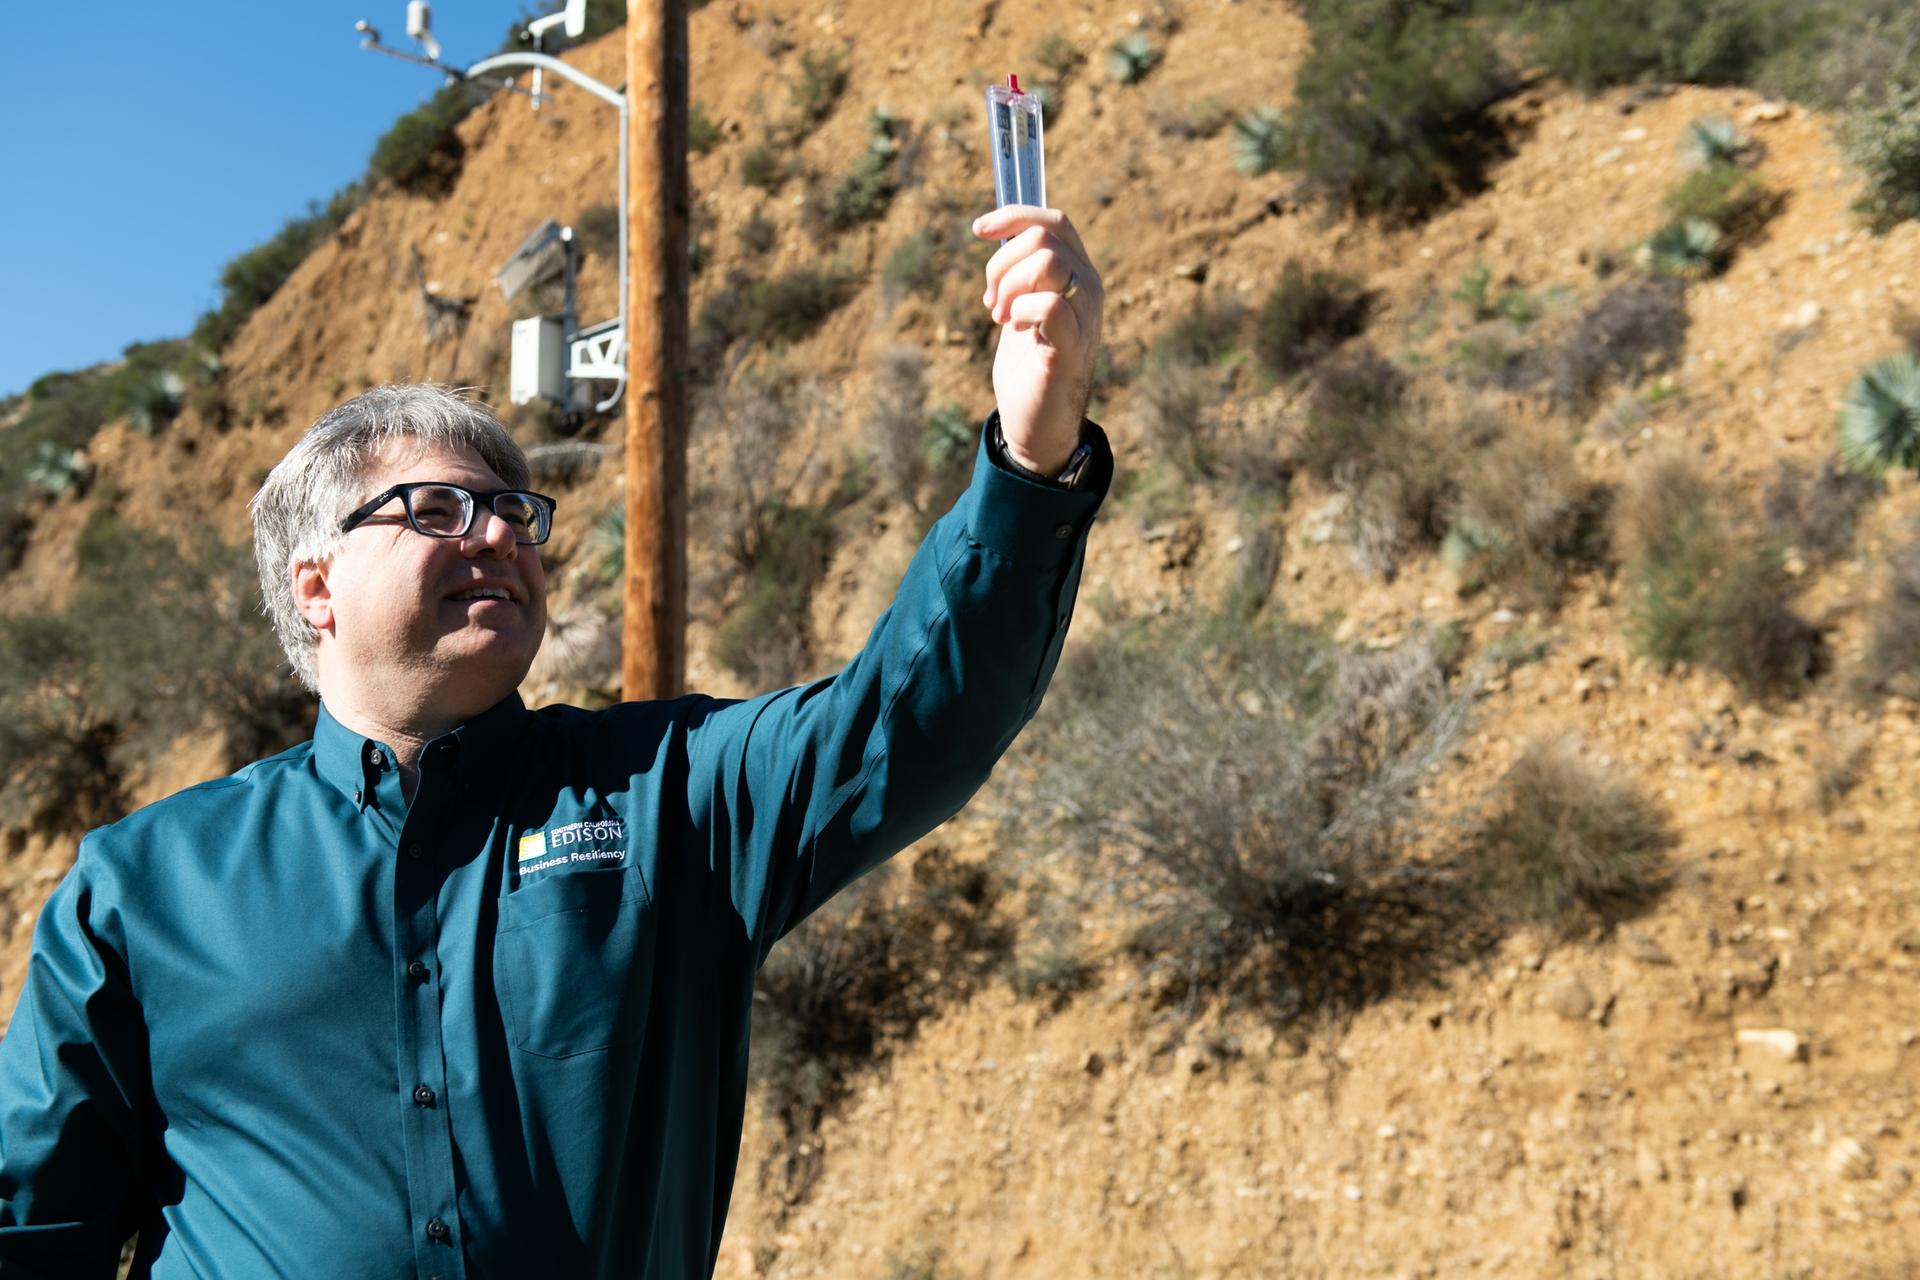 SCE fire scientist Tom Rolinski uses a hand-held Kestrel to measure wind speed.